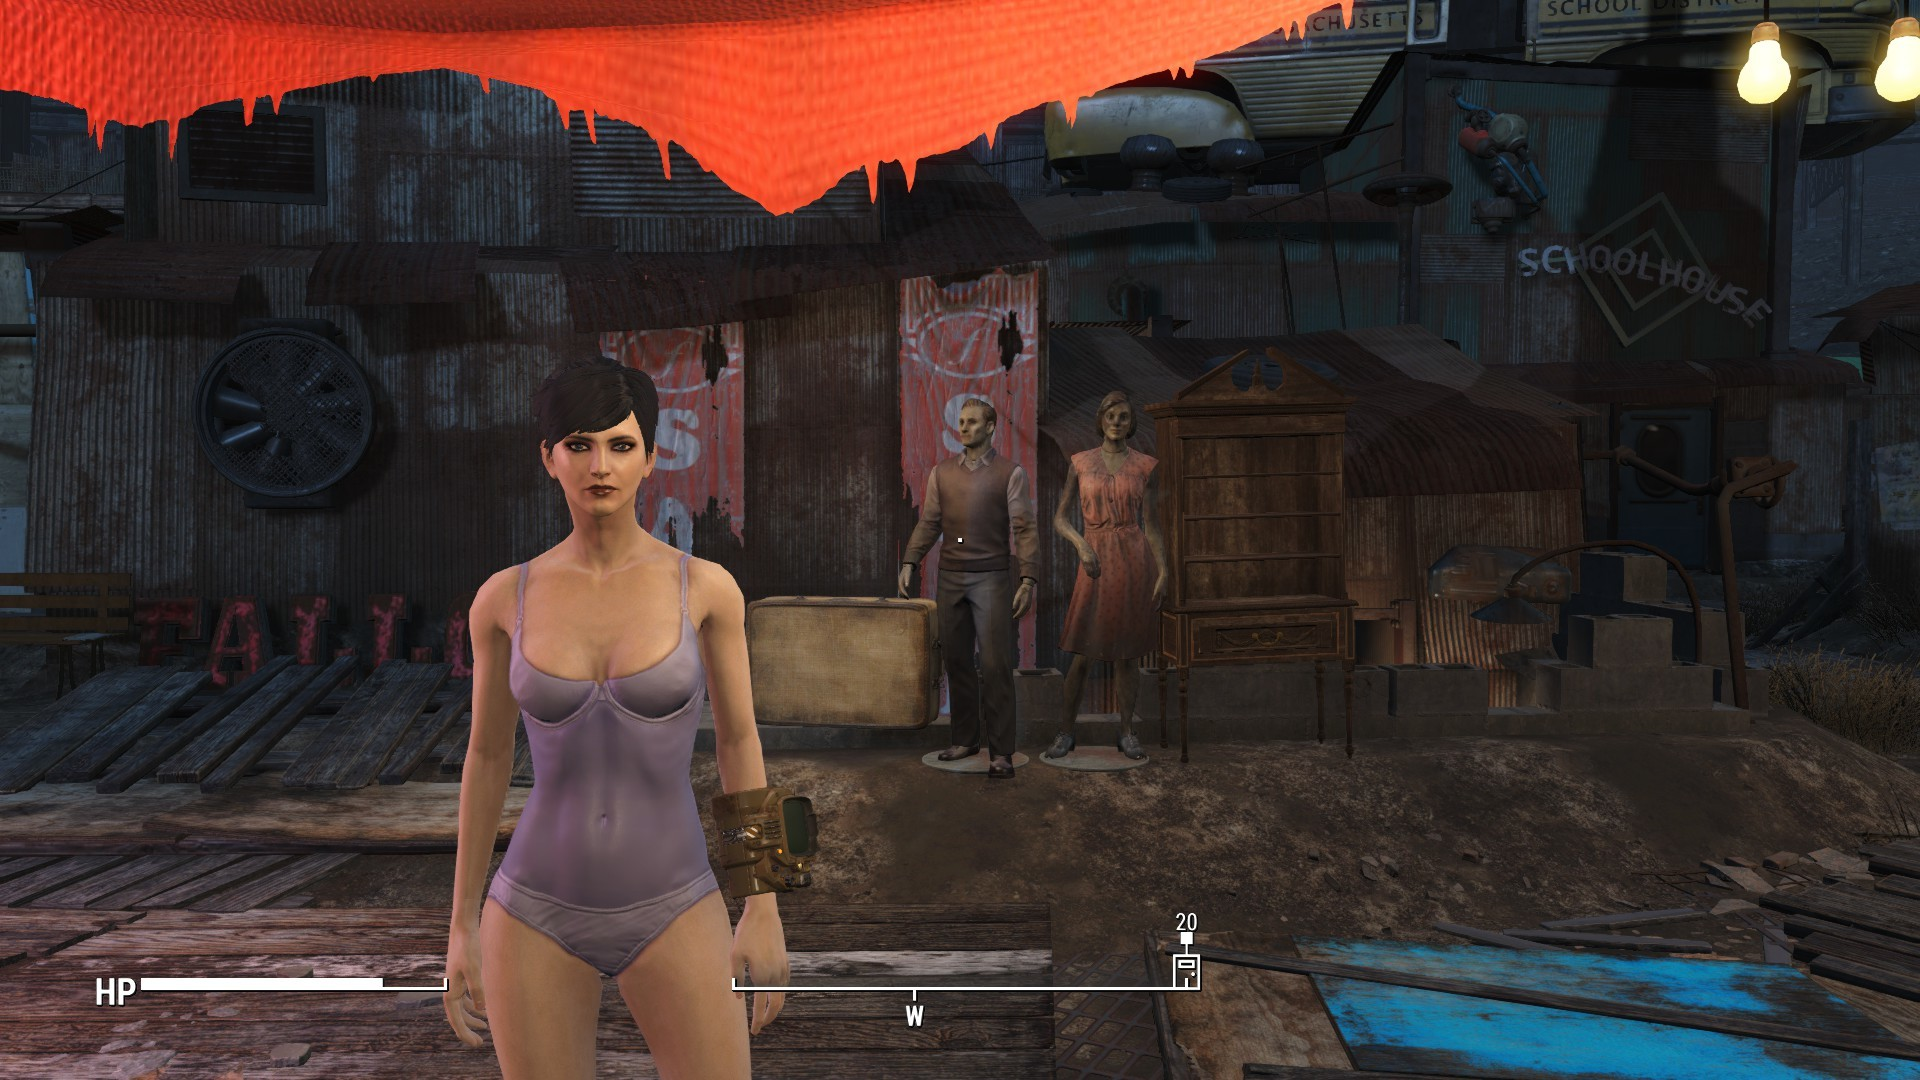 … Fallout 4 Swimsuit Instead of Underwear 2 …